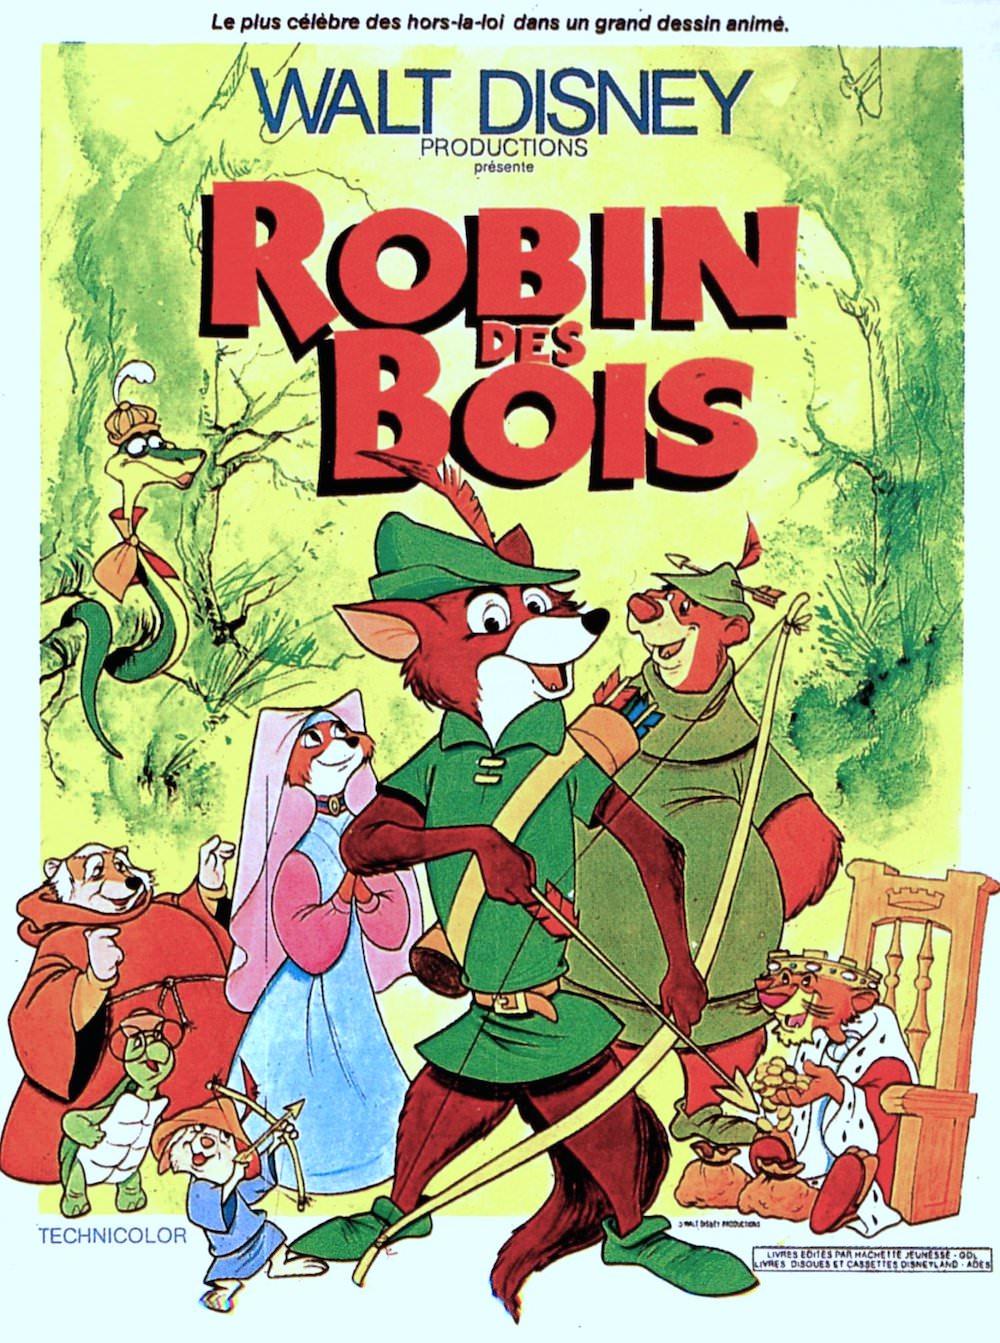 Robin des bois reitherman